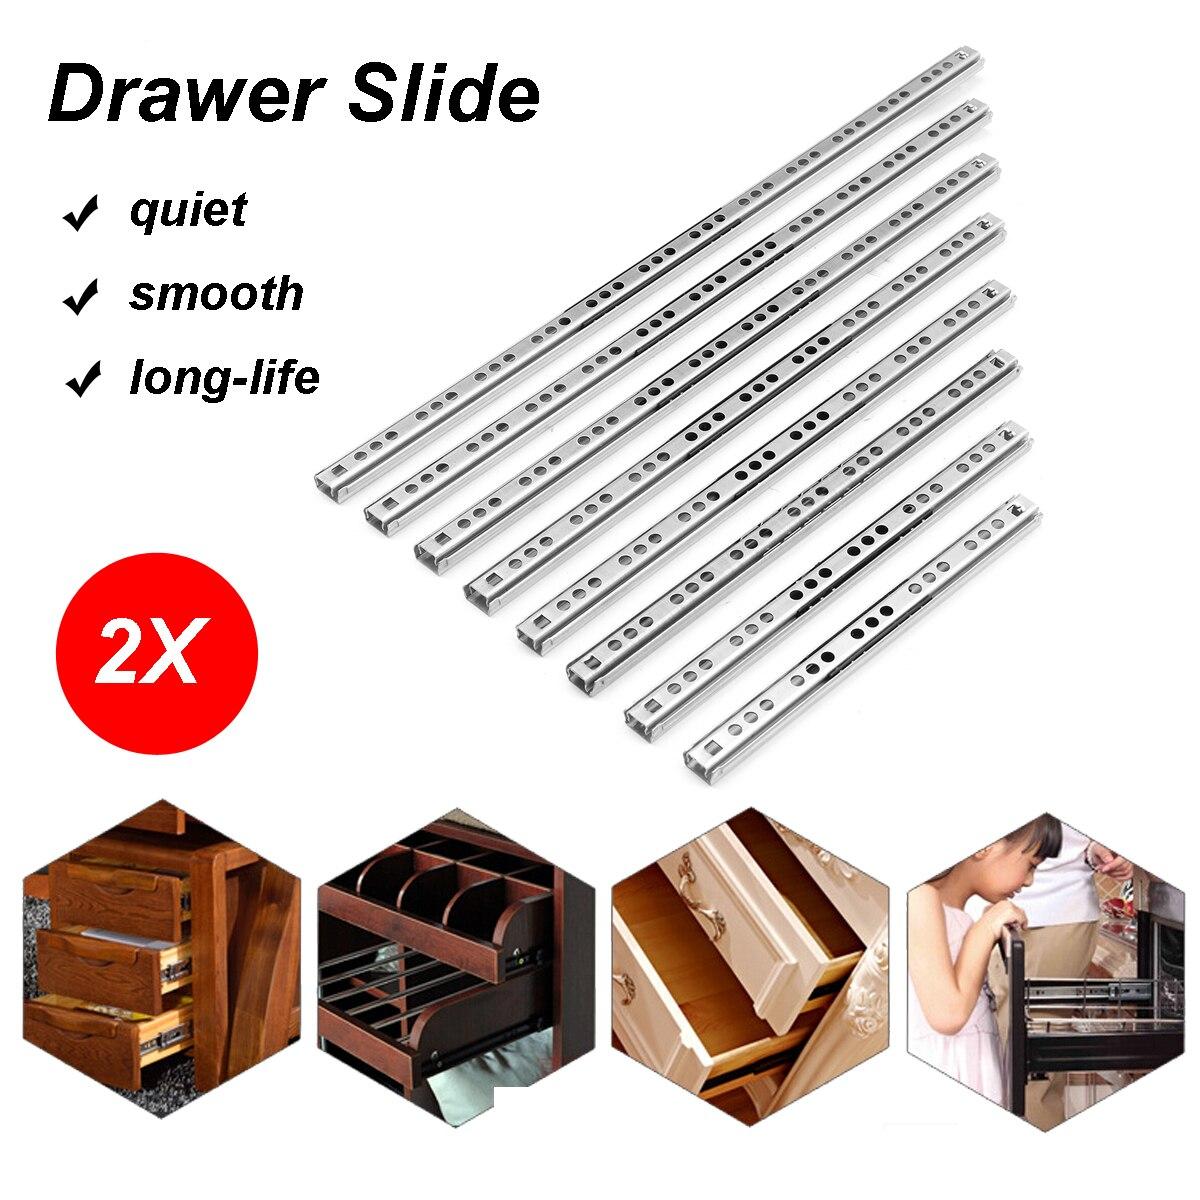 "2Pcs 8""-16"" Ball Bearing Drawer Slides Steel Ball Bearing Slides Keyboard Cabinet Runners Cupboard Drawer For Furniture Slide"